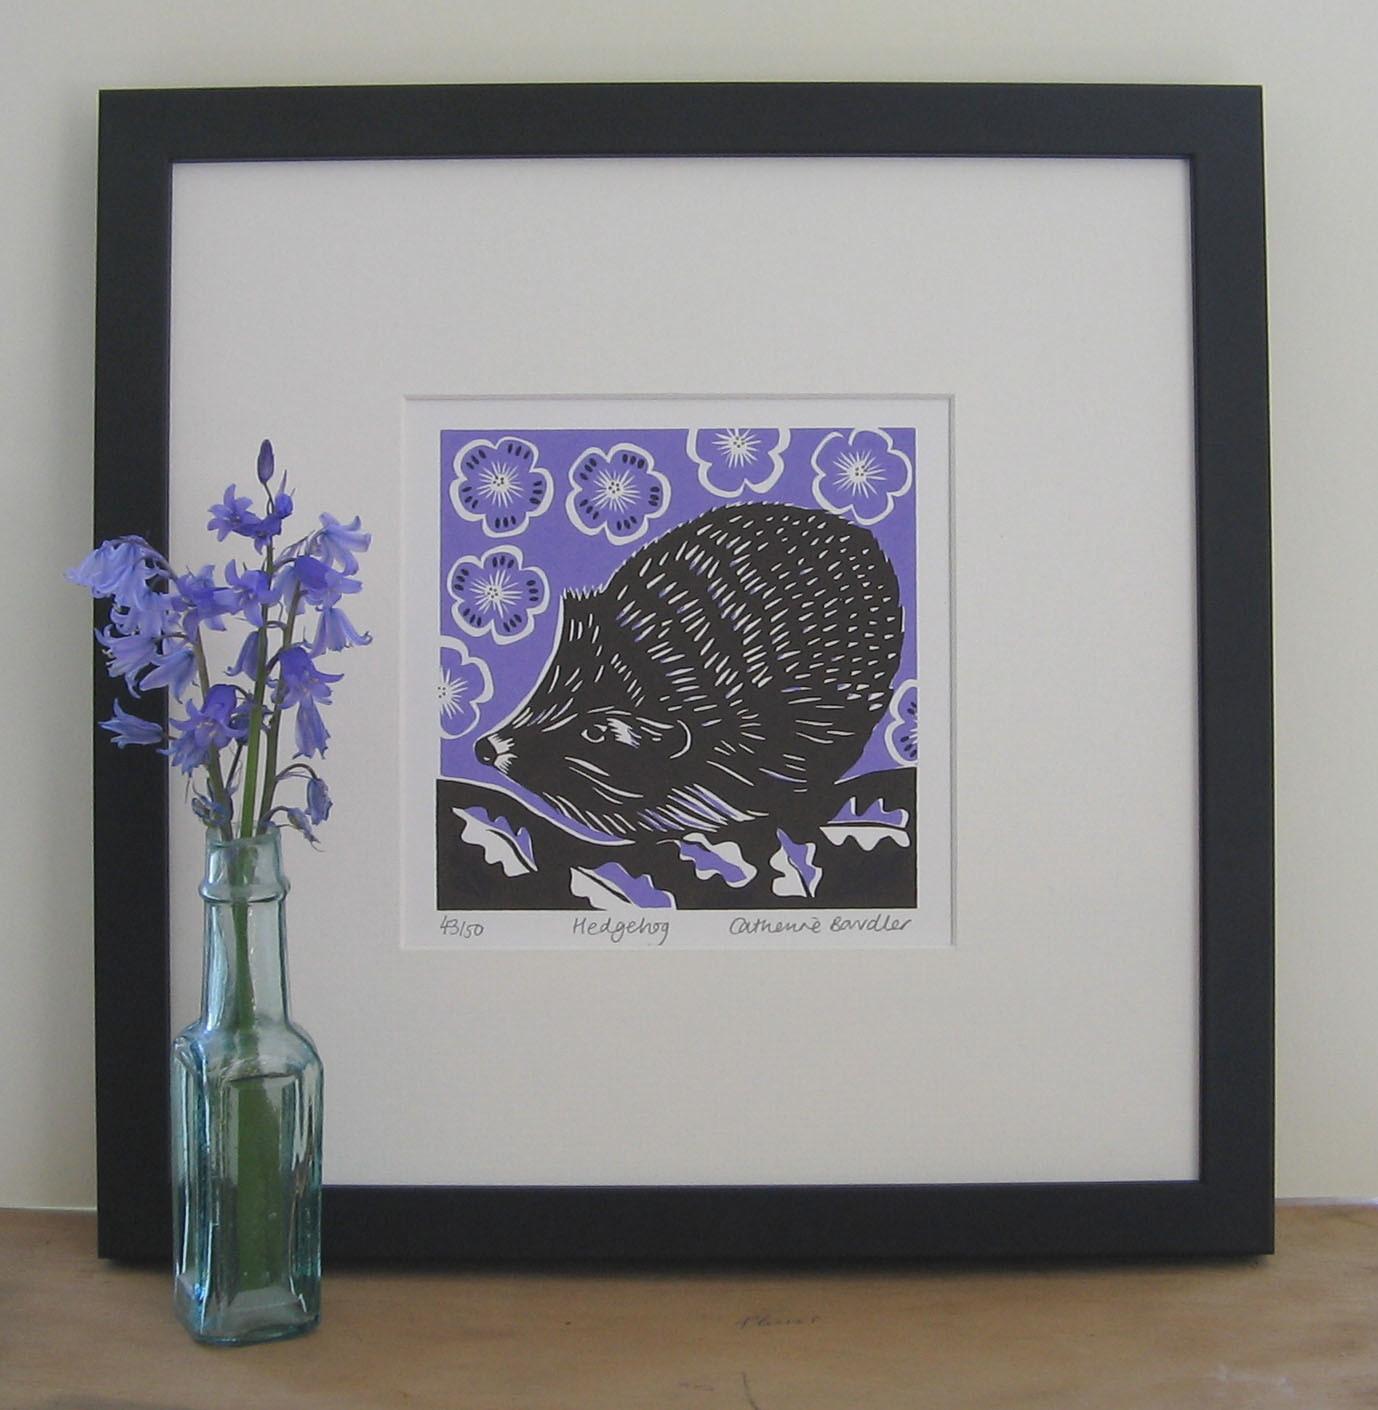 Hedgehog   screenprint   13 x 13 cm  £20 (unframed)